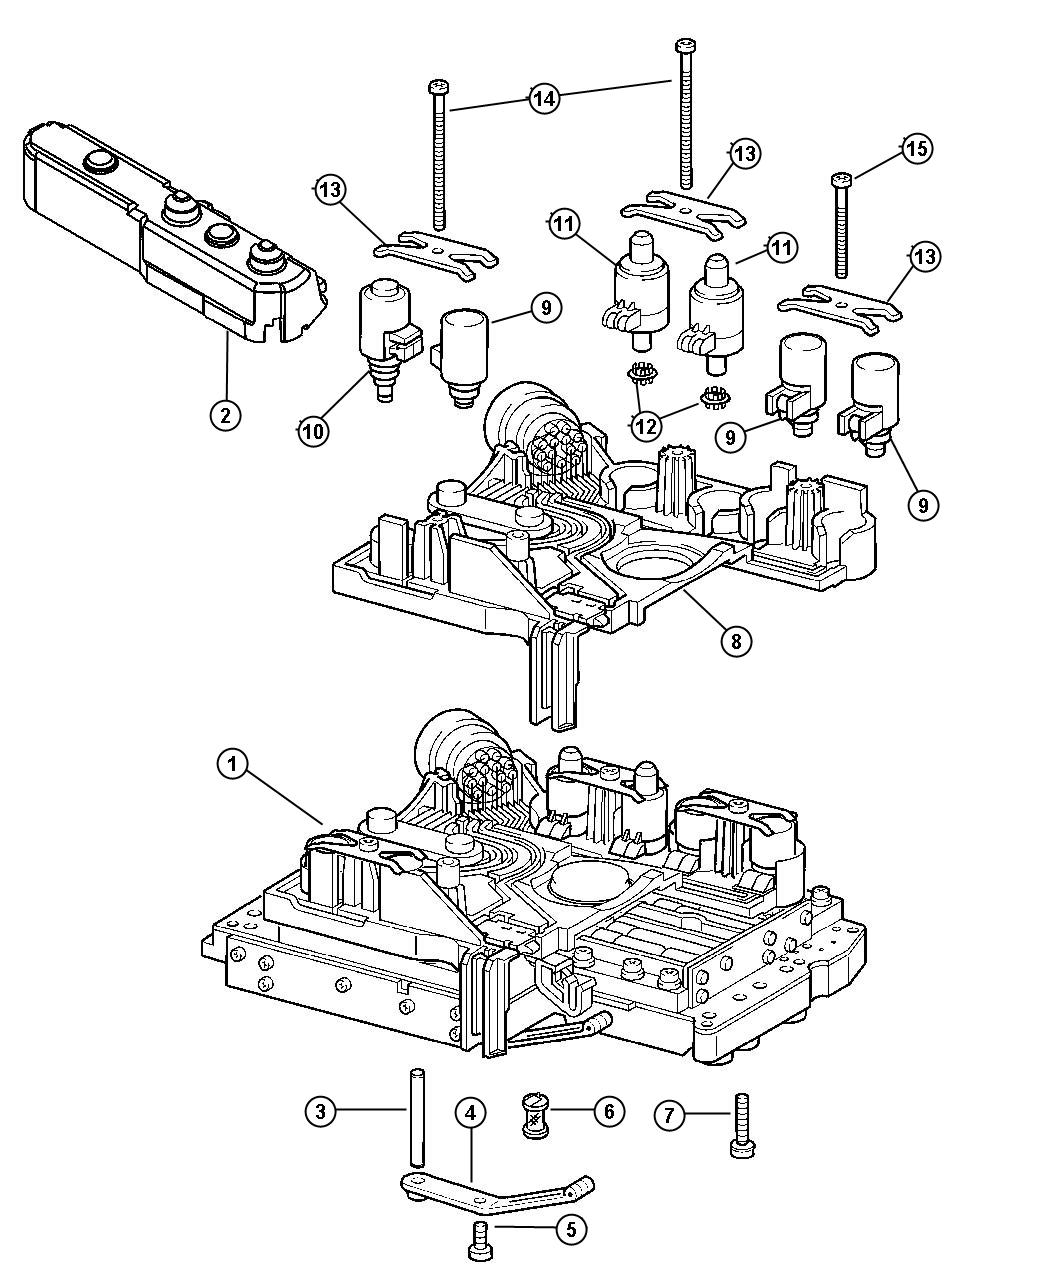 2004 Chrysler Crossfire Magnet, solenoid. Transmission